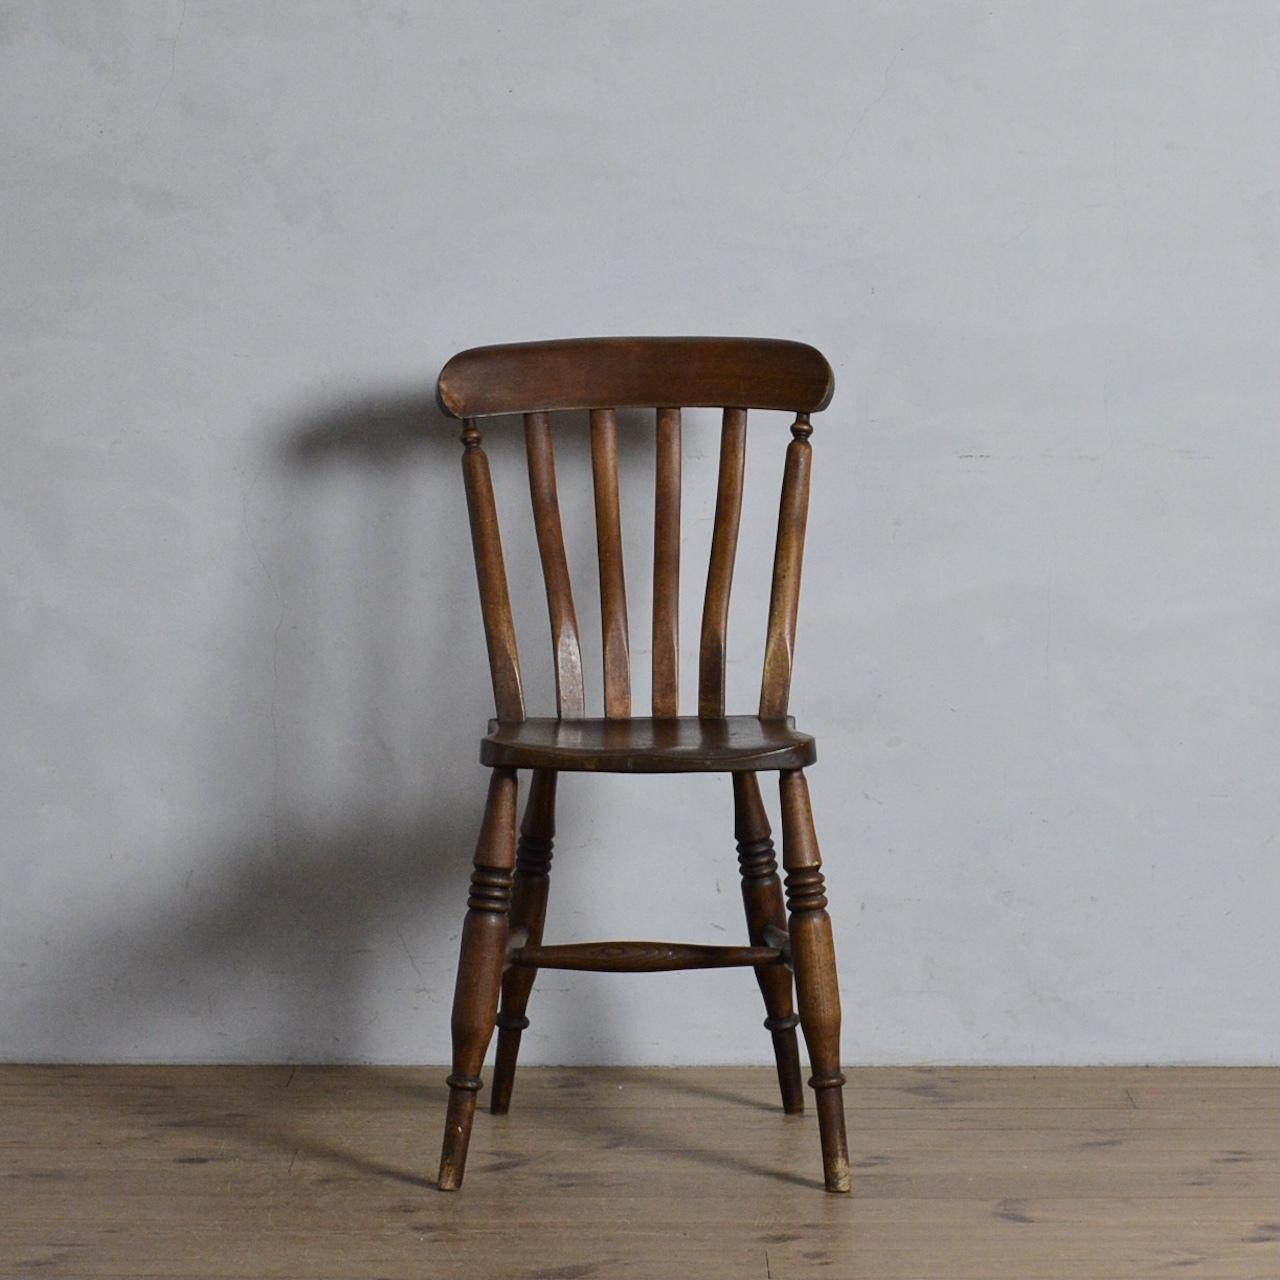 Kitchen Chair / キッチン チェア【A】〈ダイニングチェア・ウィンザーチェア・デスクチェア・椅子・カントリー〉 112066